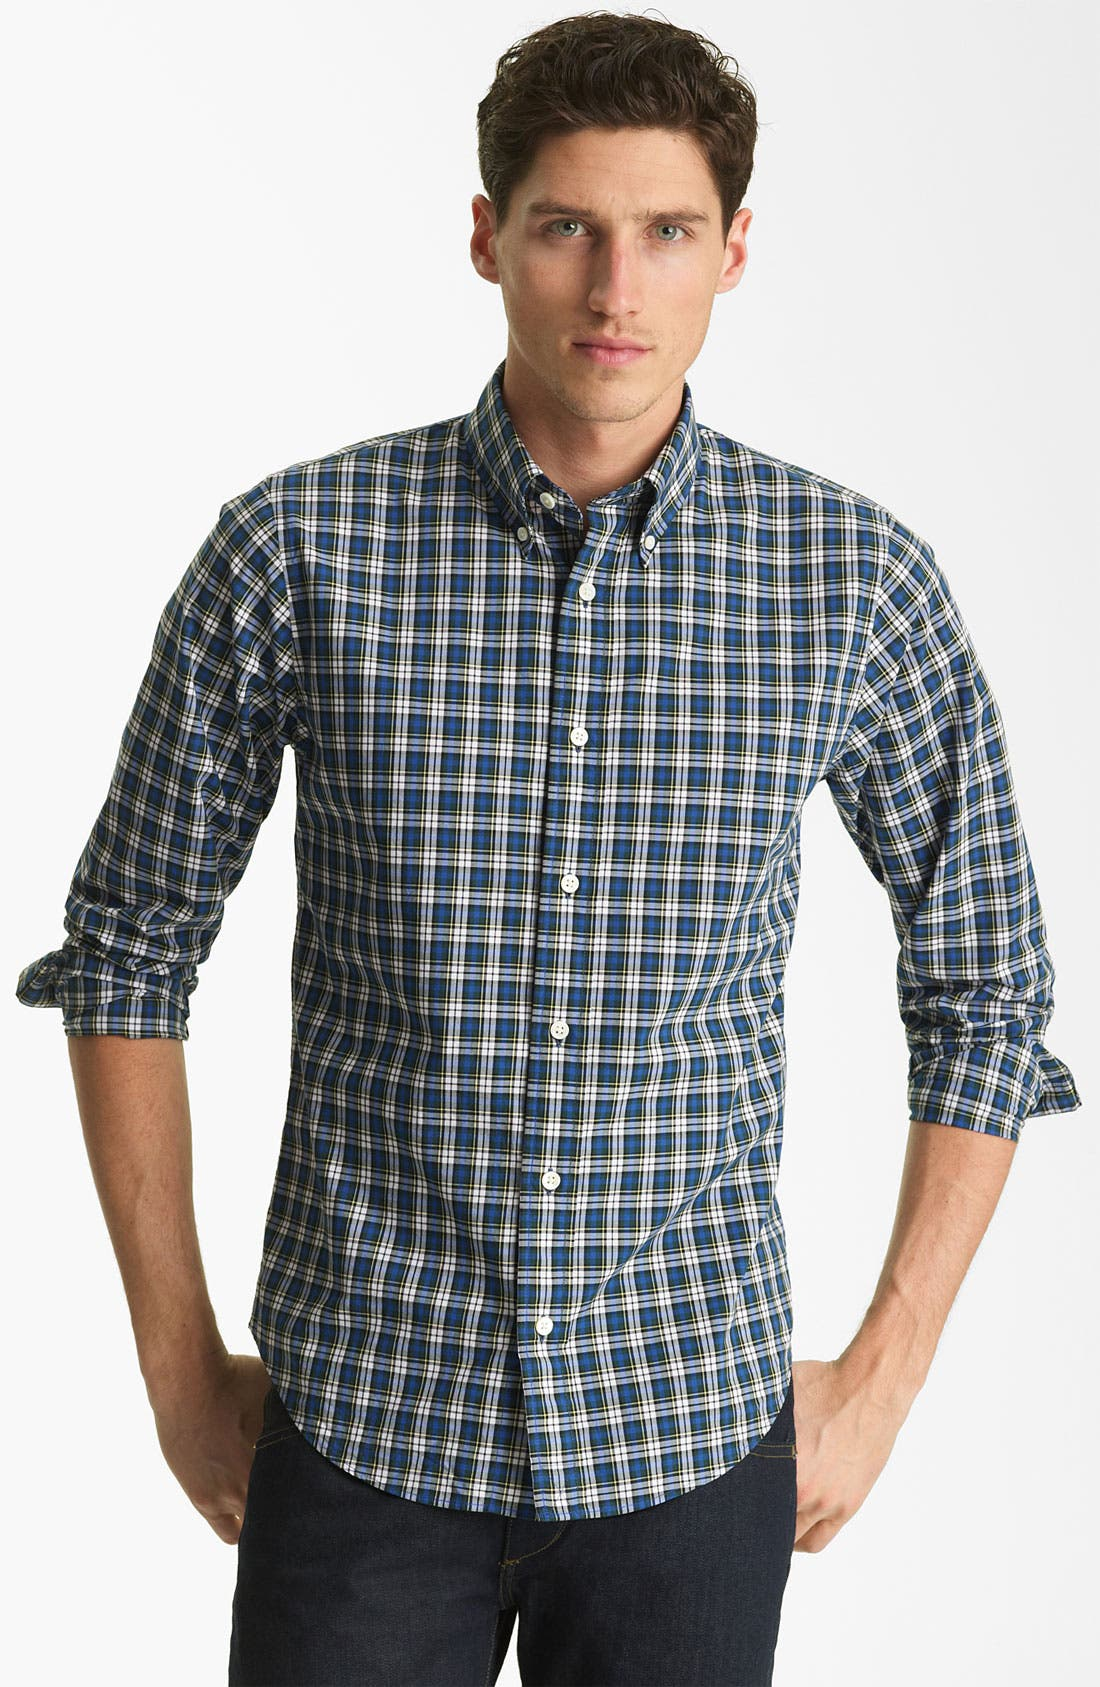 Main Image - Jack Spade 'Gibson' Plaid Woven Shirt